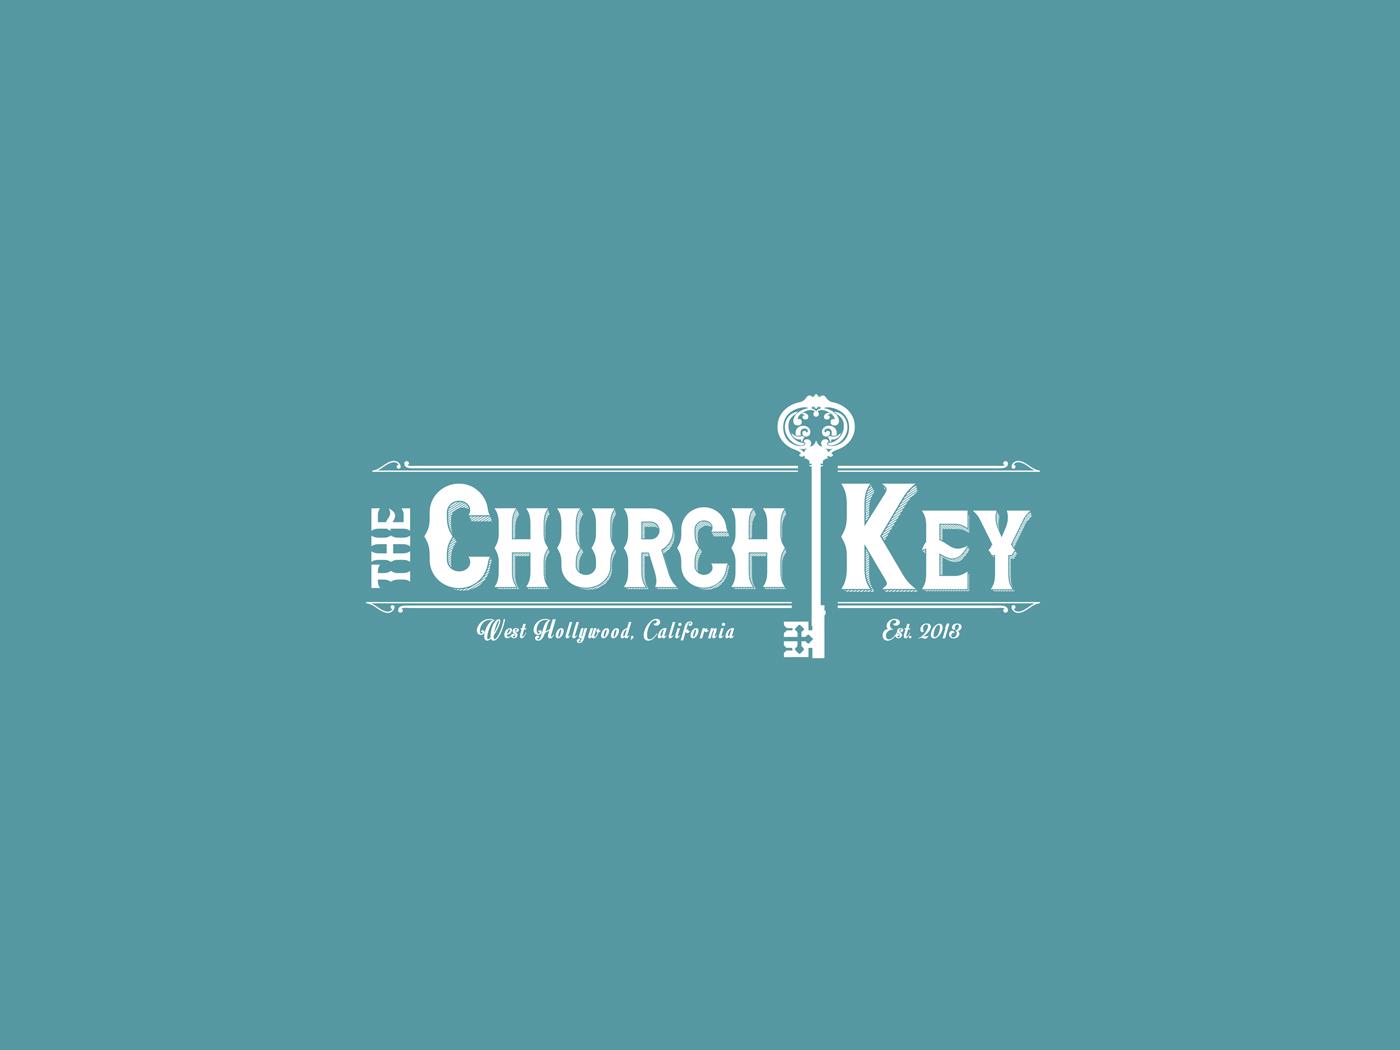 _0000_churchkey1.jpg